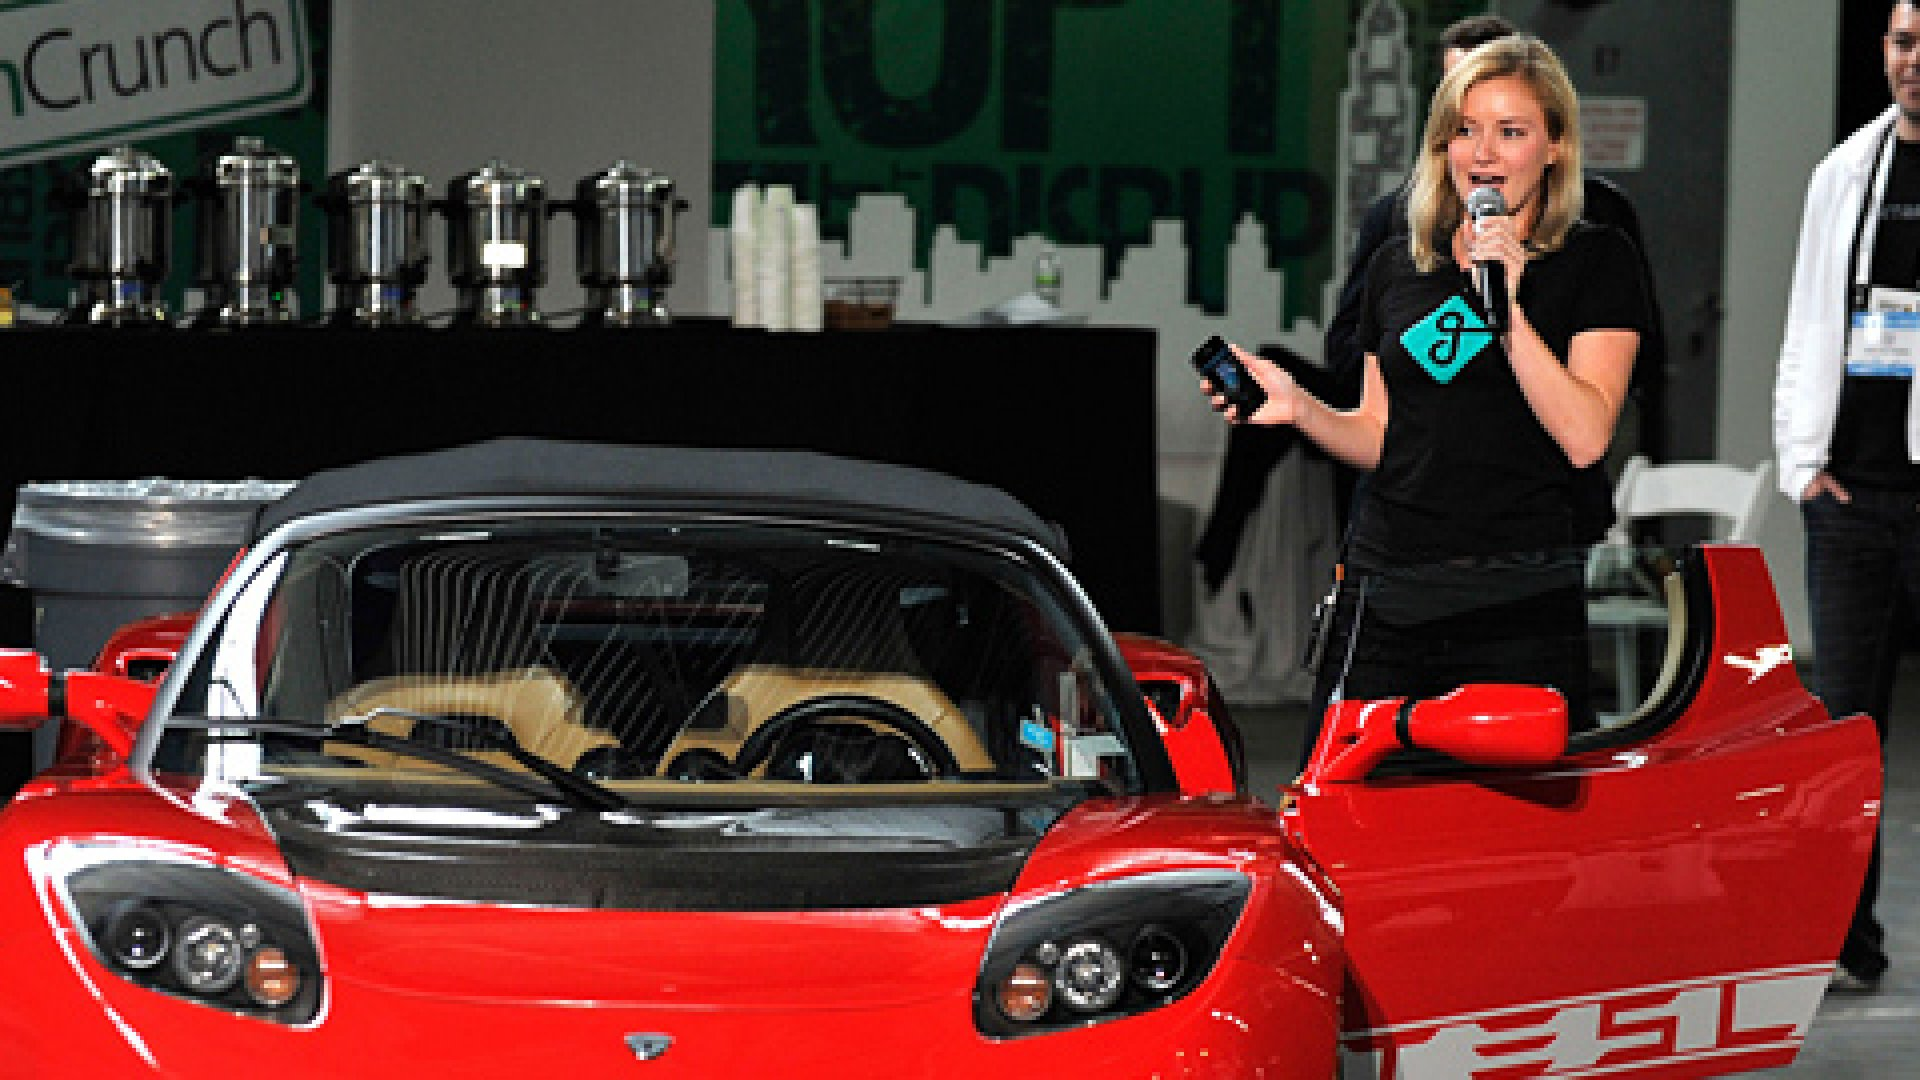 Jessica Scorpio of Getaround attends TechCrunch Disrupt New York May 2011